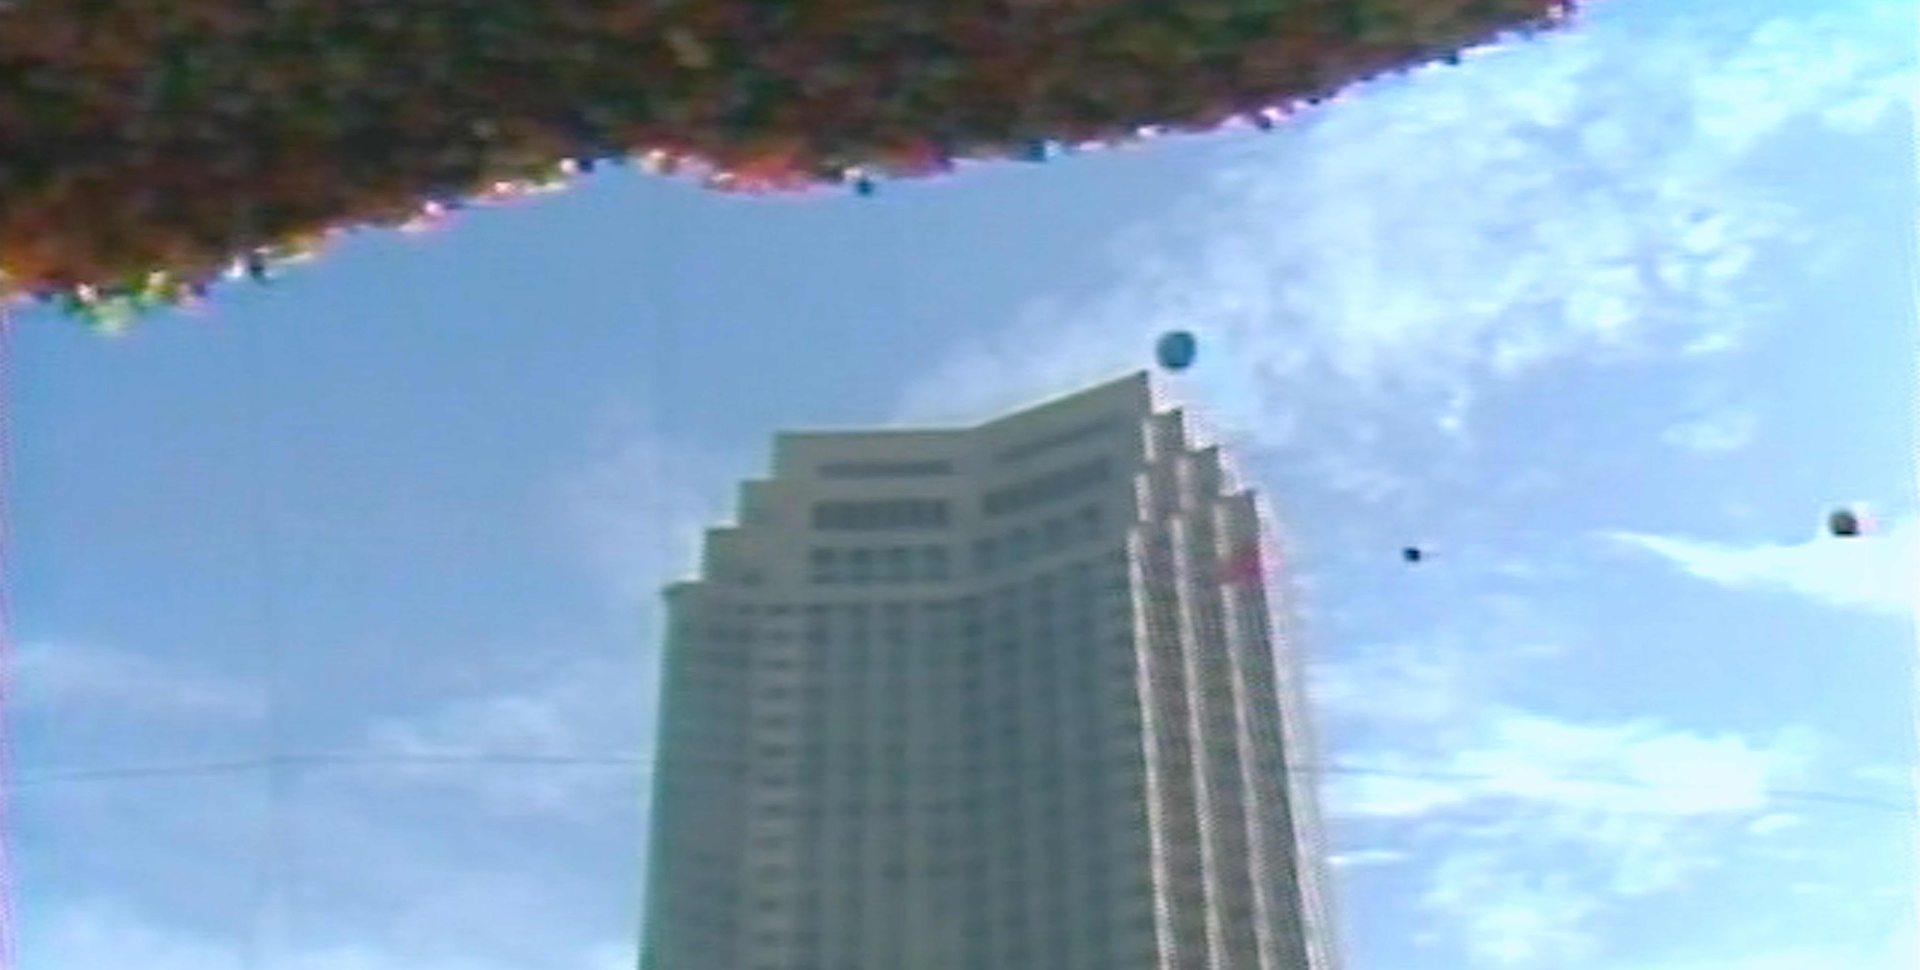 http://mdfilmfest.com/wp-content/uploads/BalloonFest_web.jpg